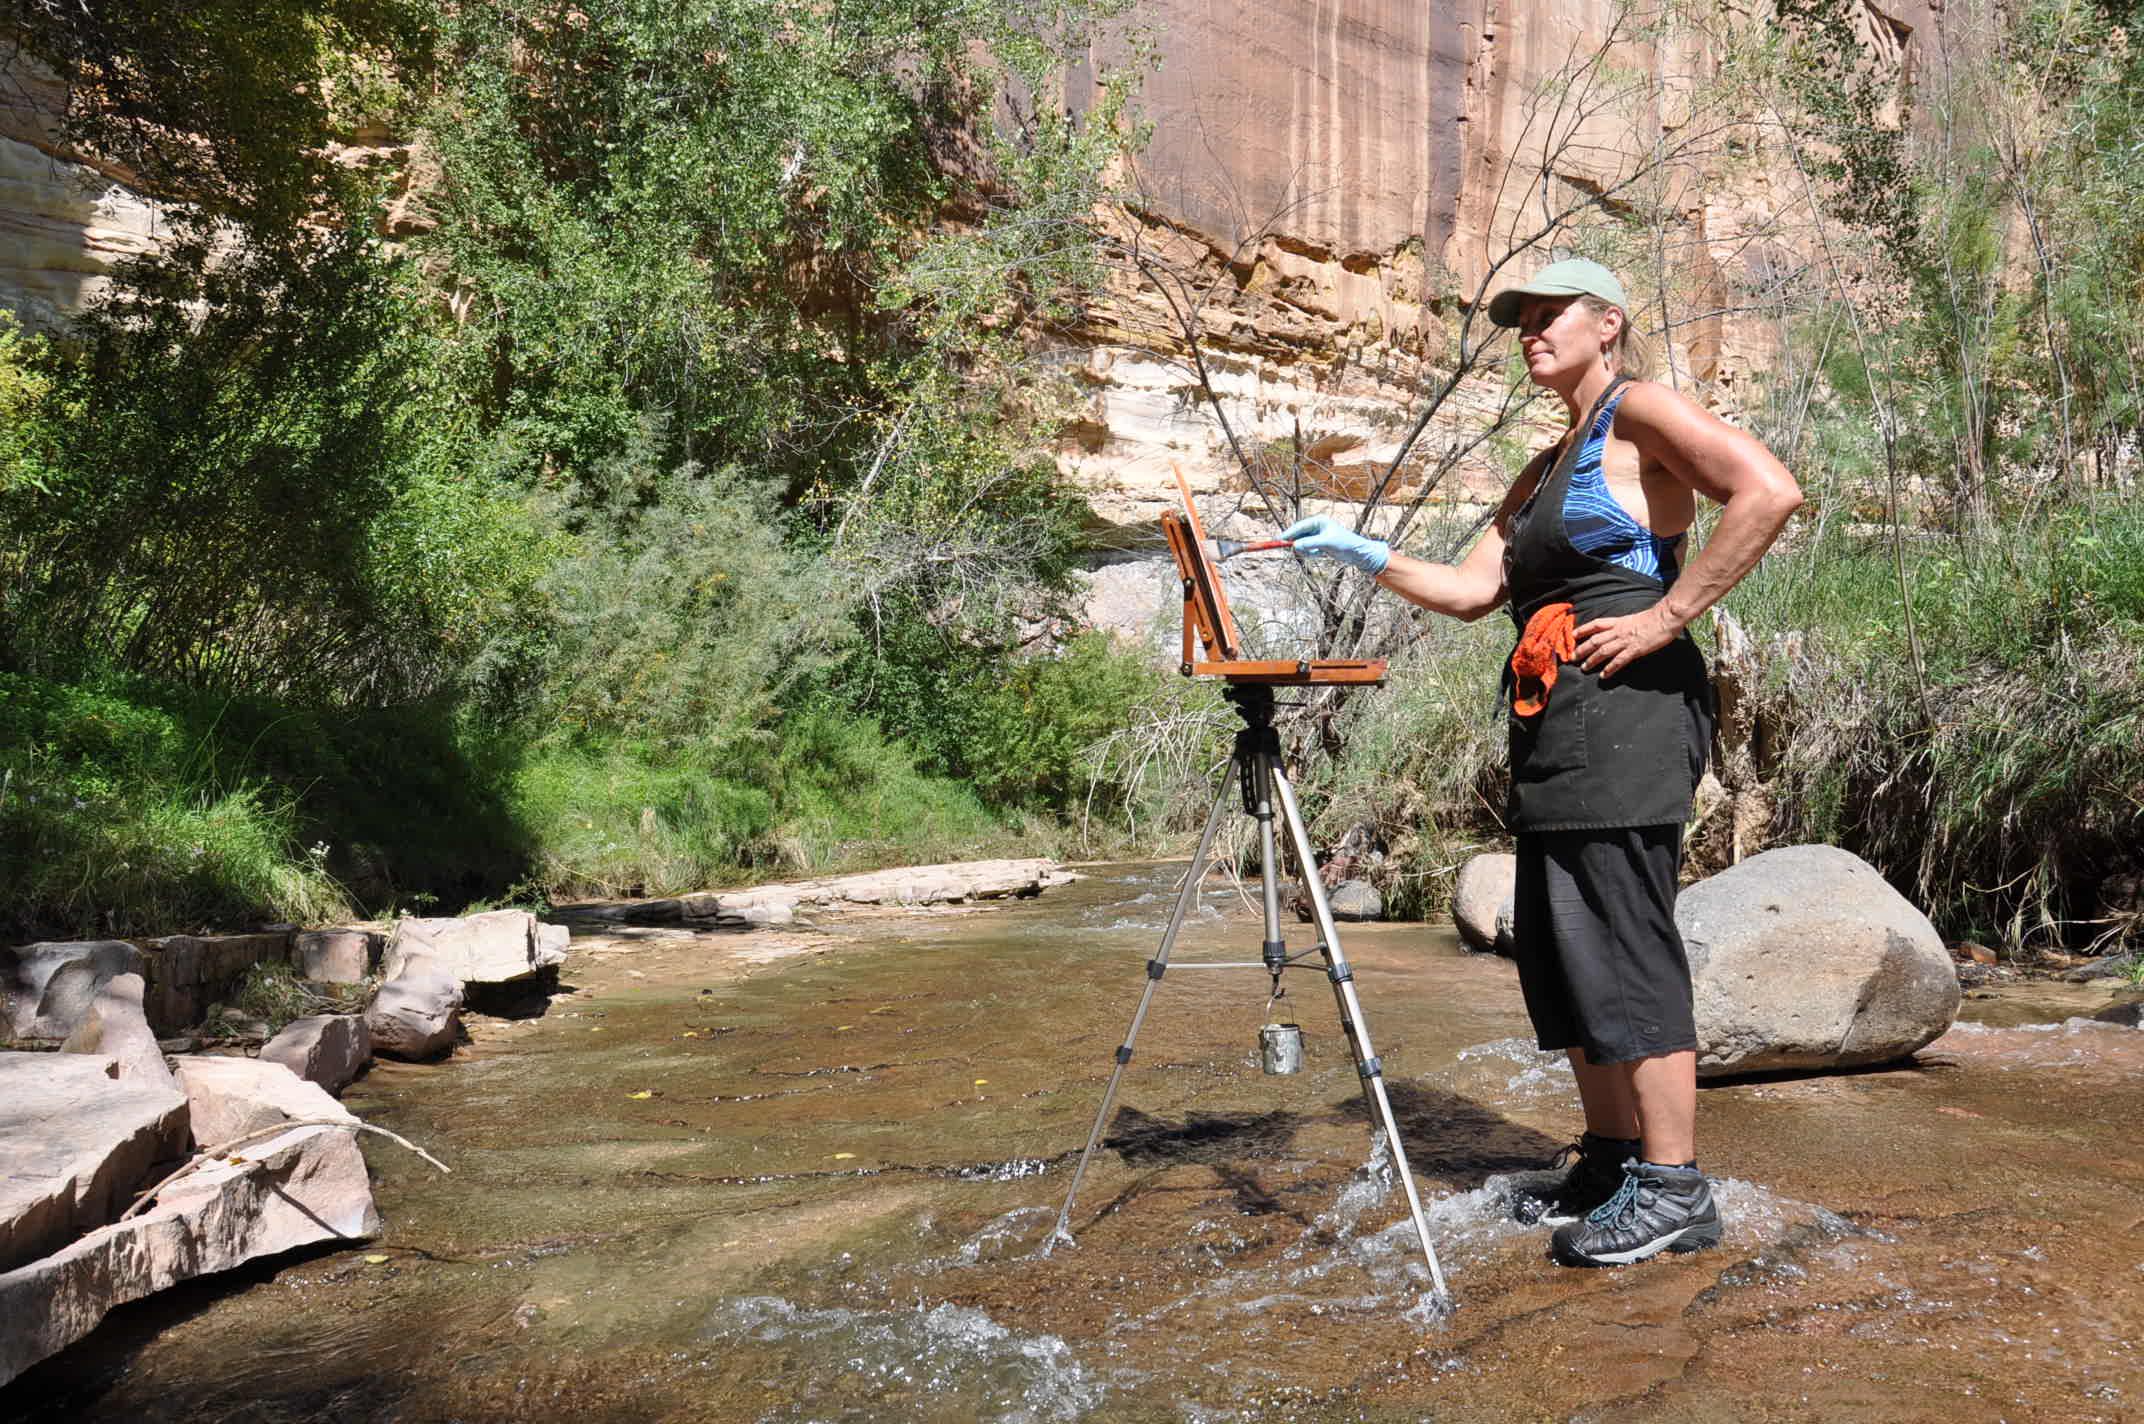 Artist Loretta Domaszewski paints along the Escalante River.